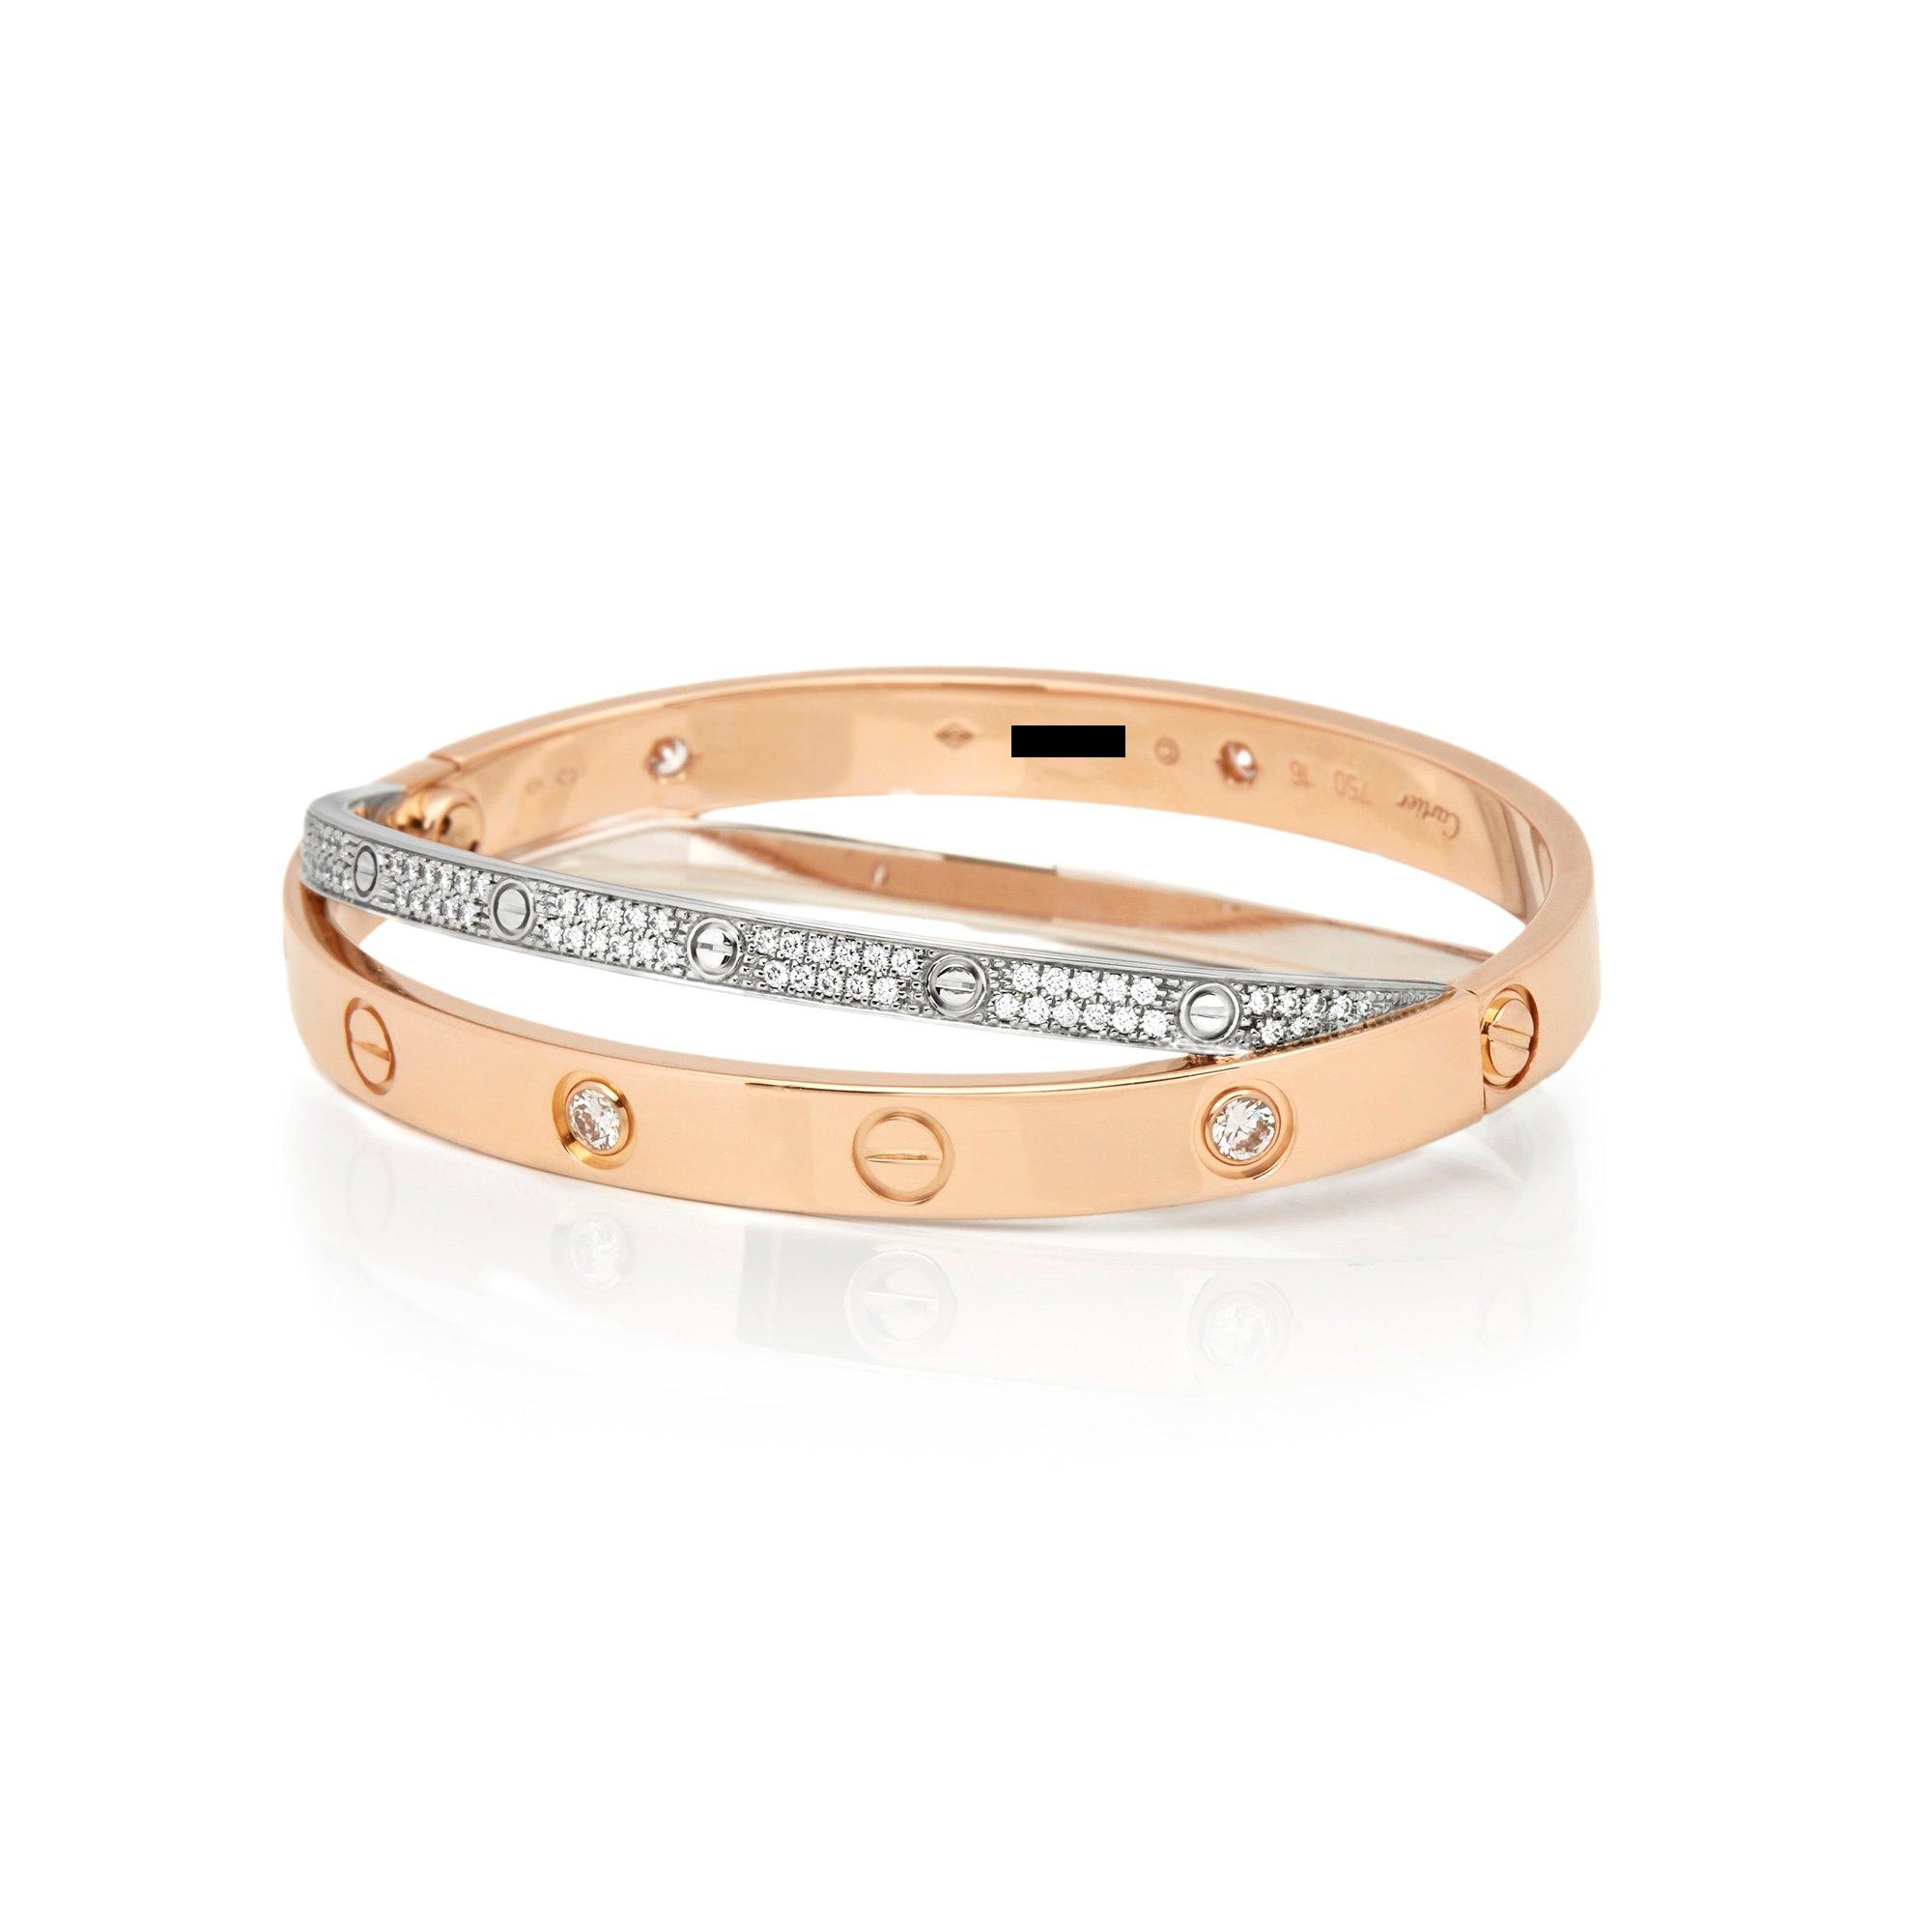 Cartier 18k Rose & White Gold Pavé Diamond Love Bracelet